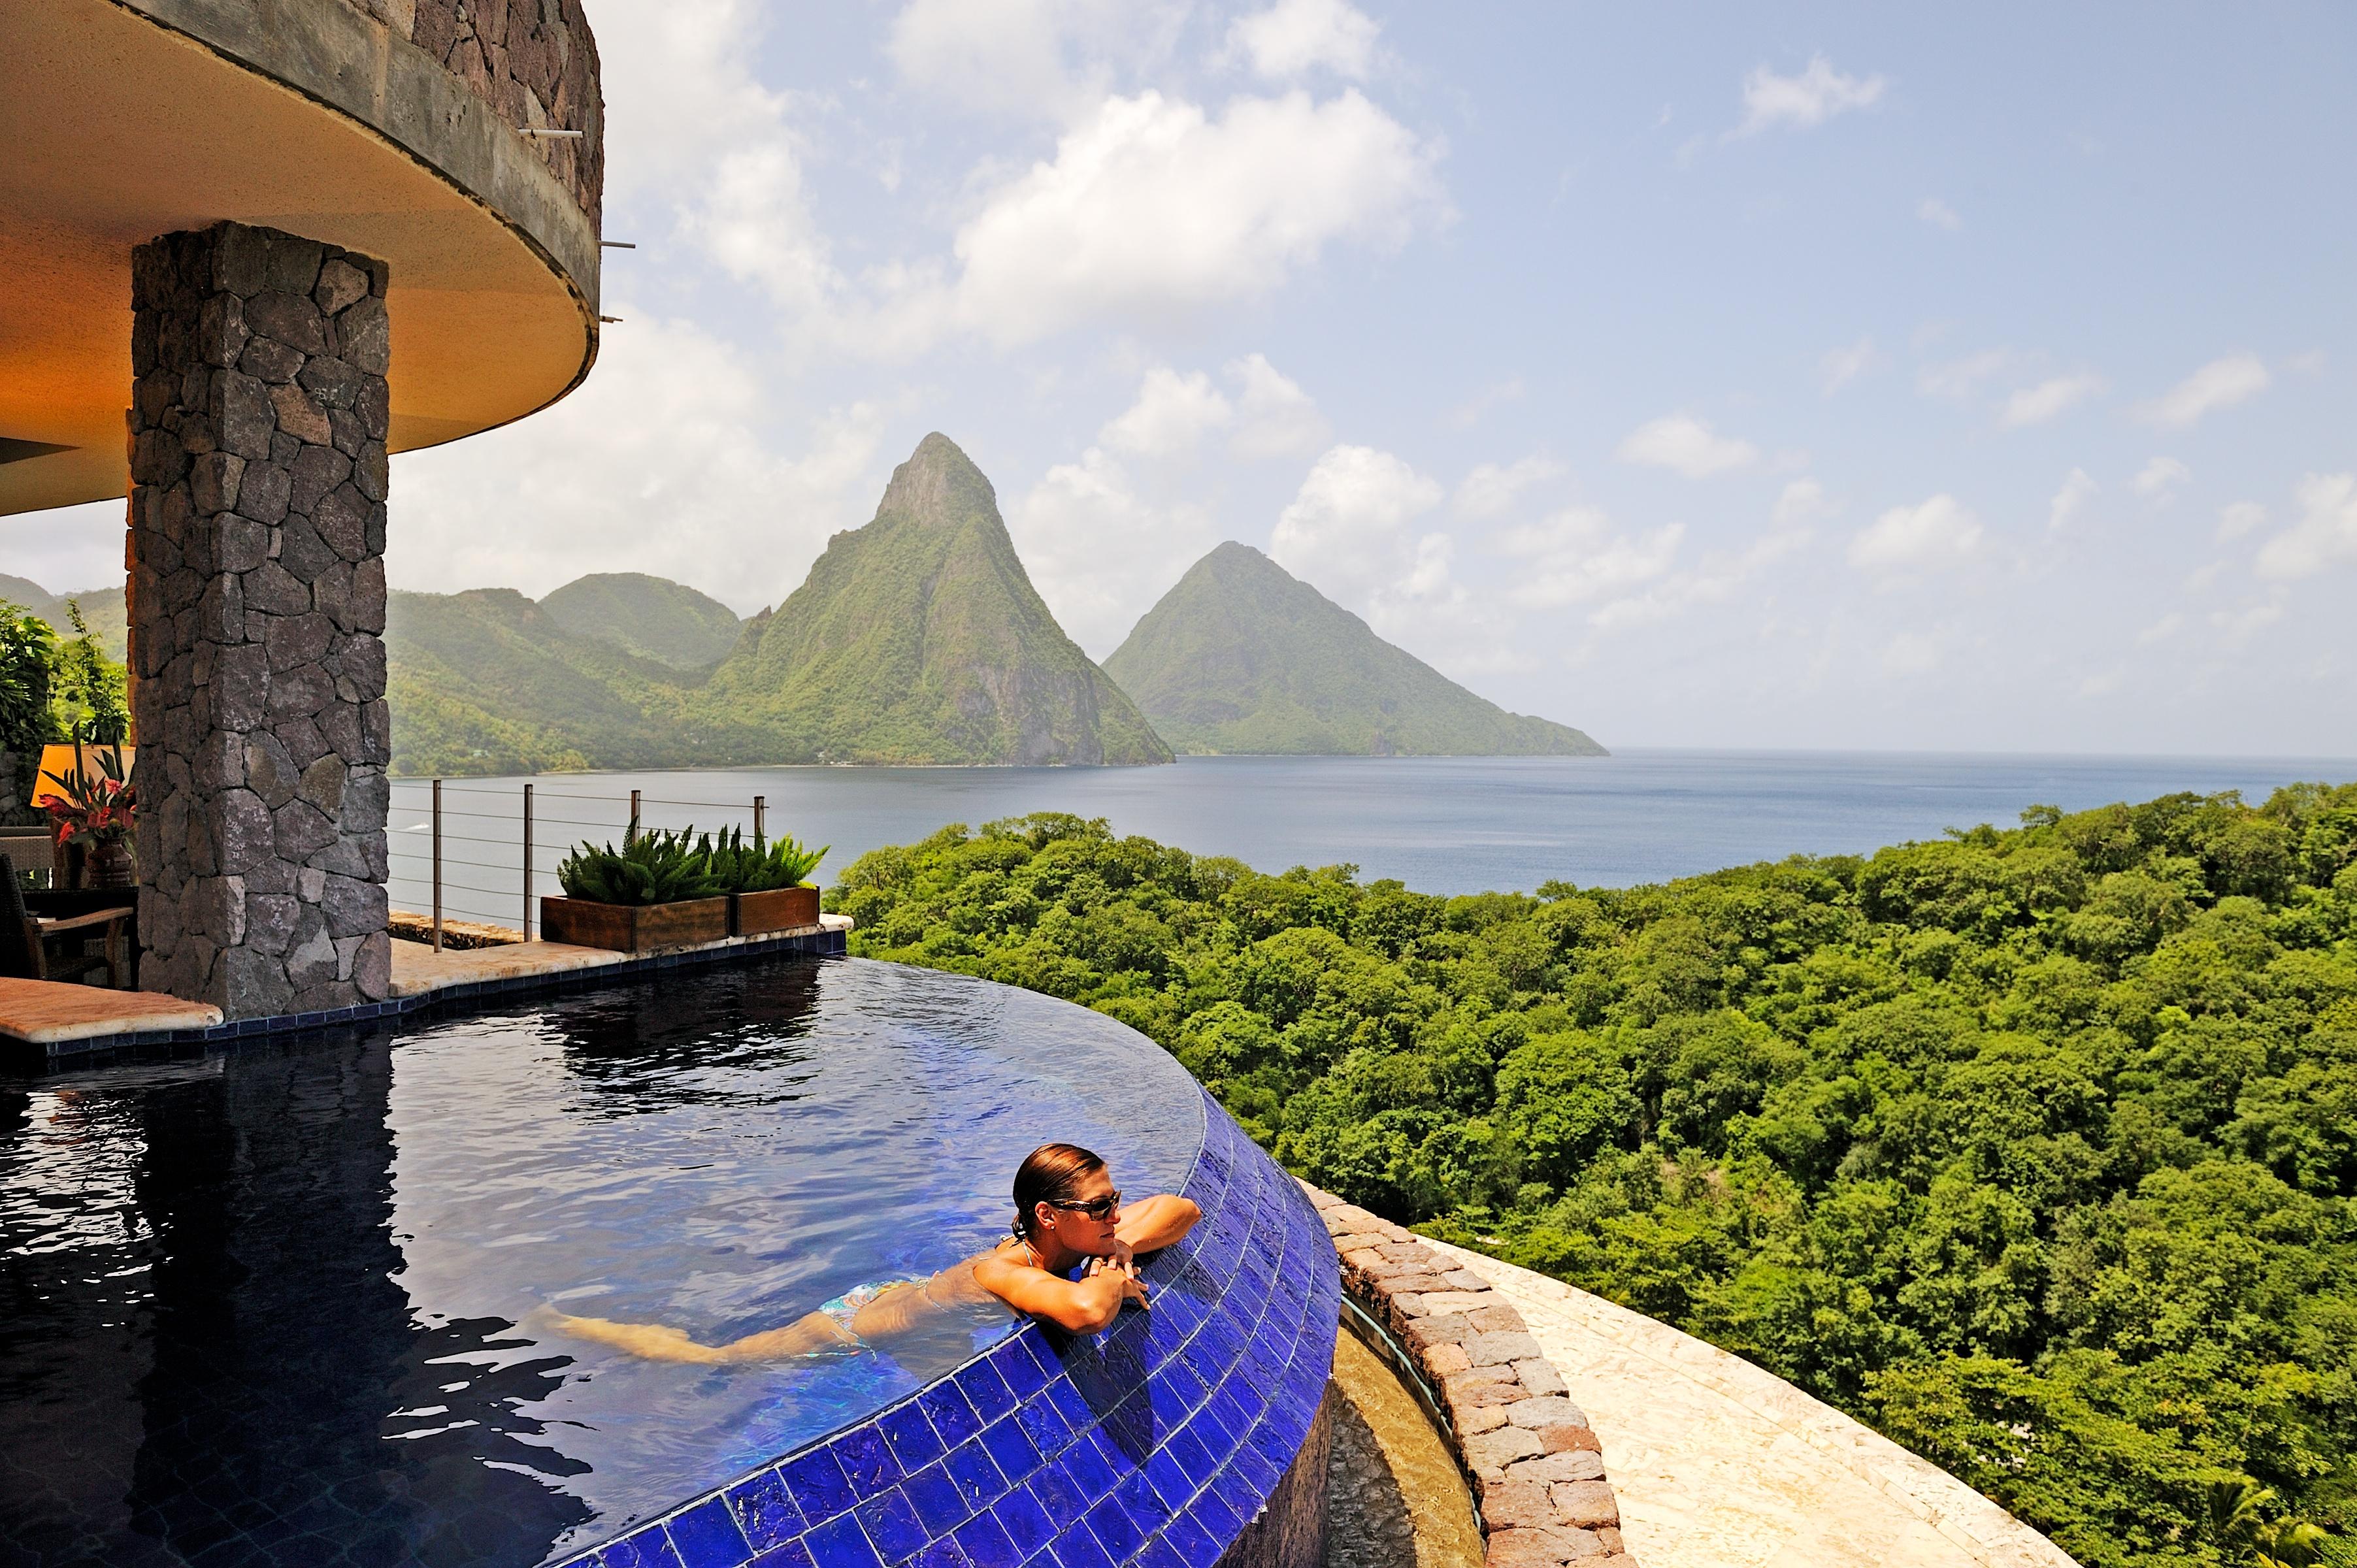 Hotel Address: PO Box 4000, Soufriere, St Lucia